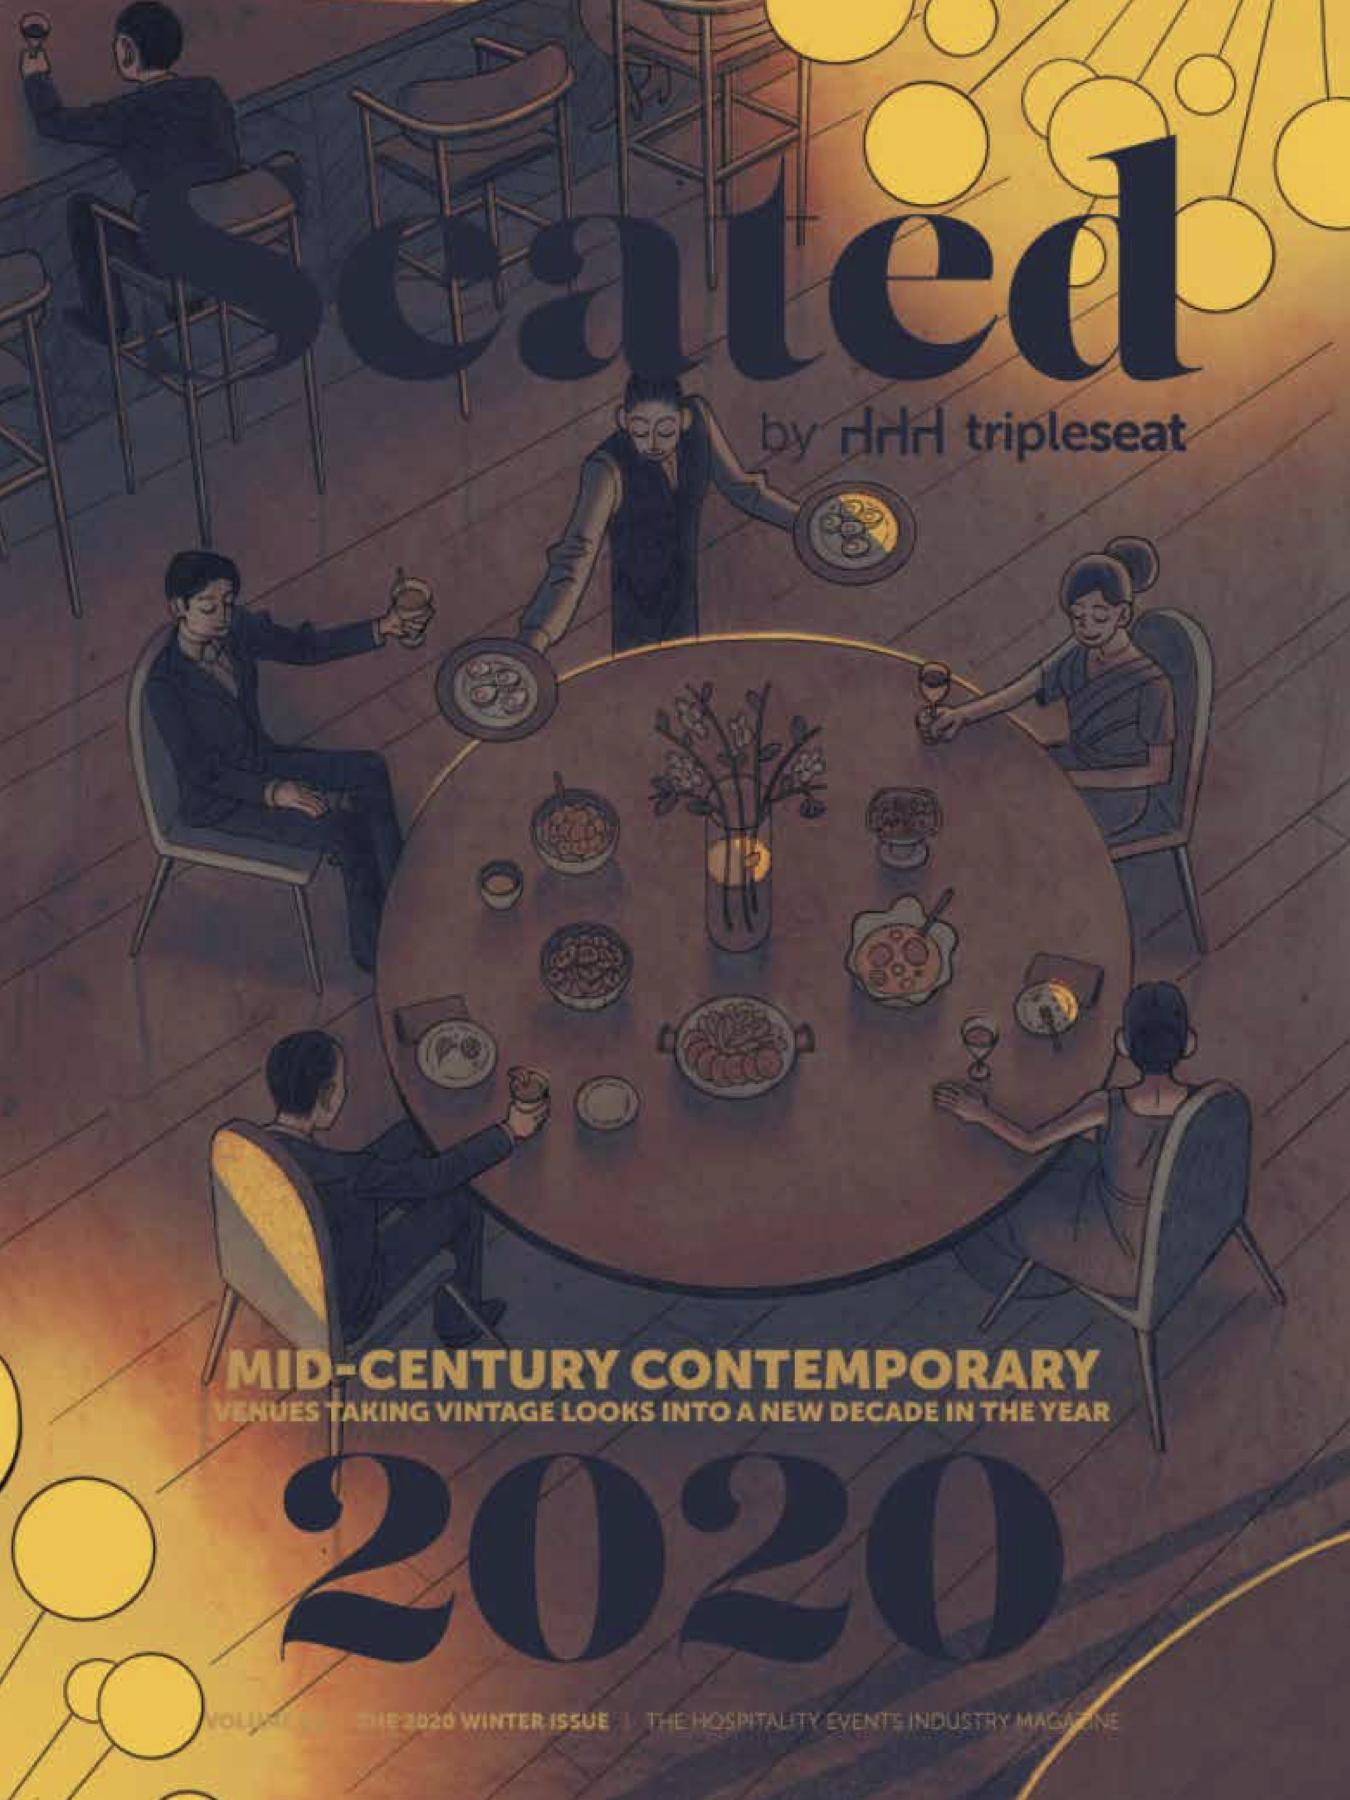 SeatedMagazine_Vol4_Fall19_FinalDraft (1)